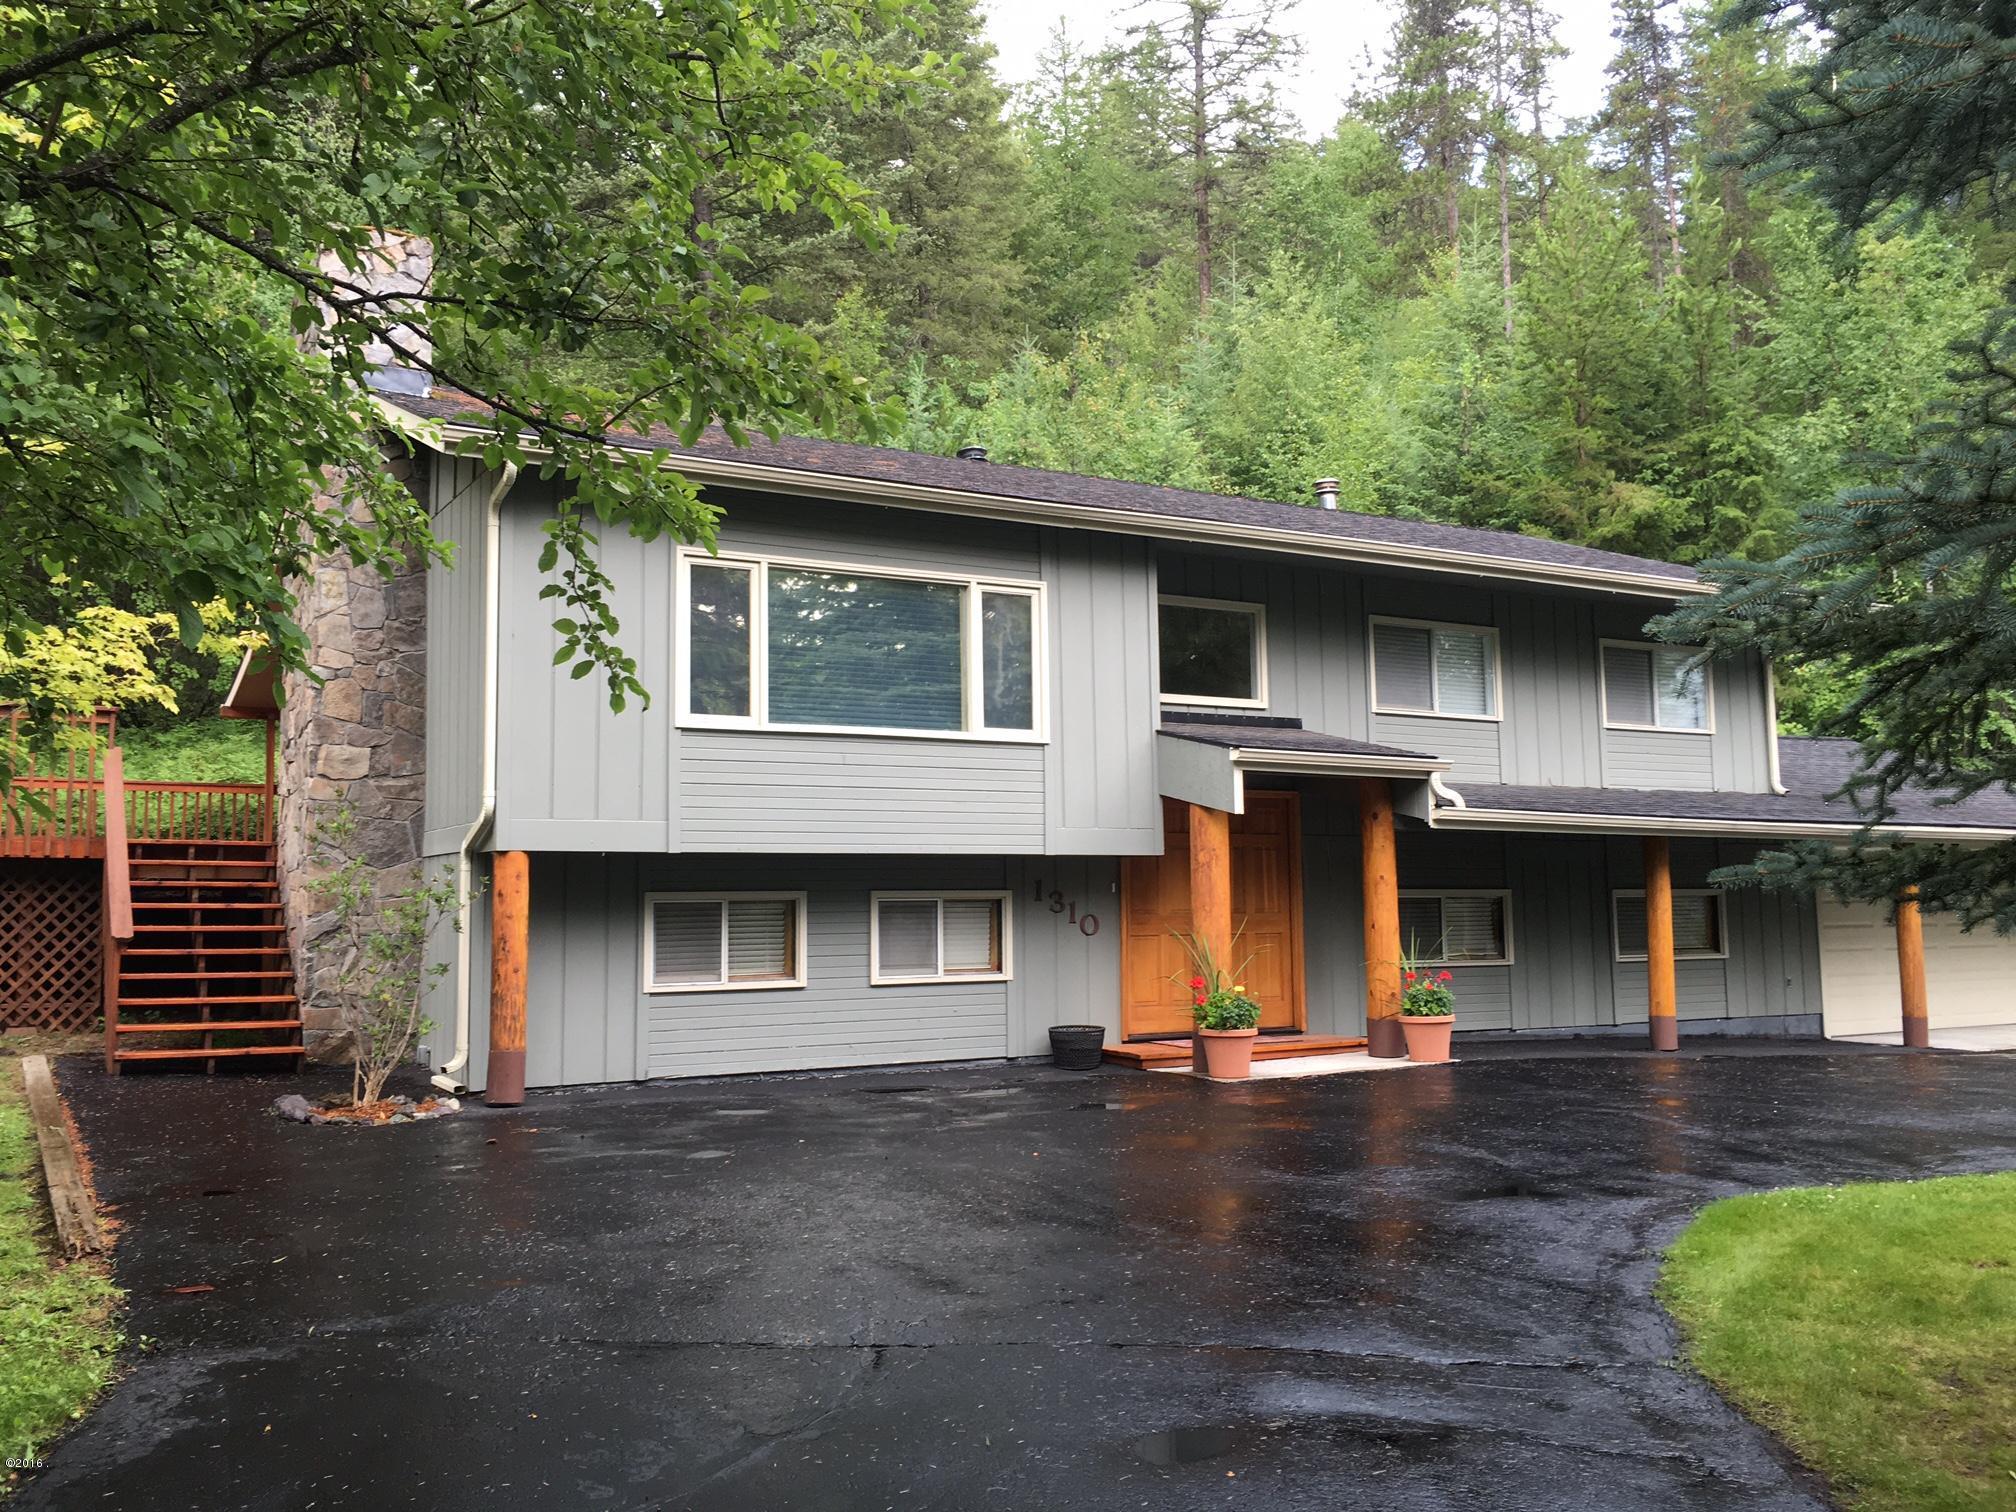 1310 Lion Mountain Drive, Whitefish, MT 59937